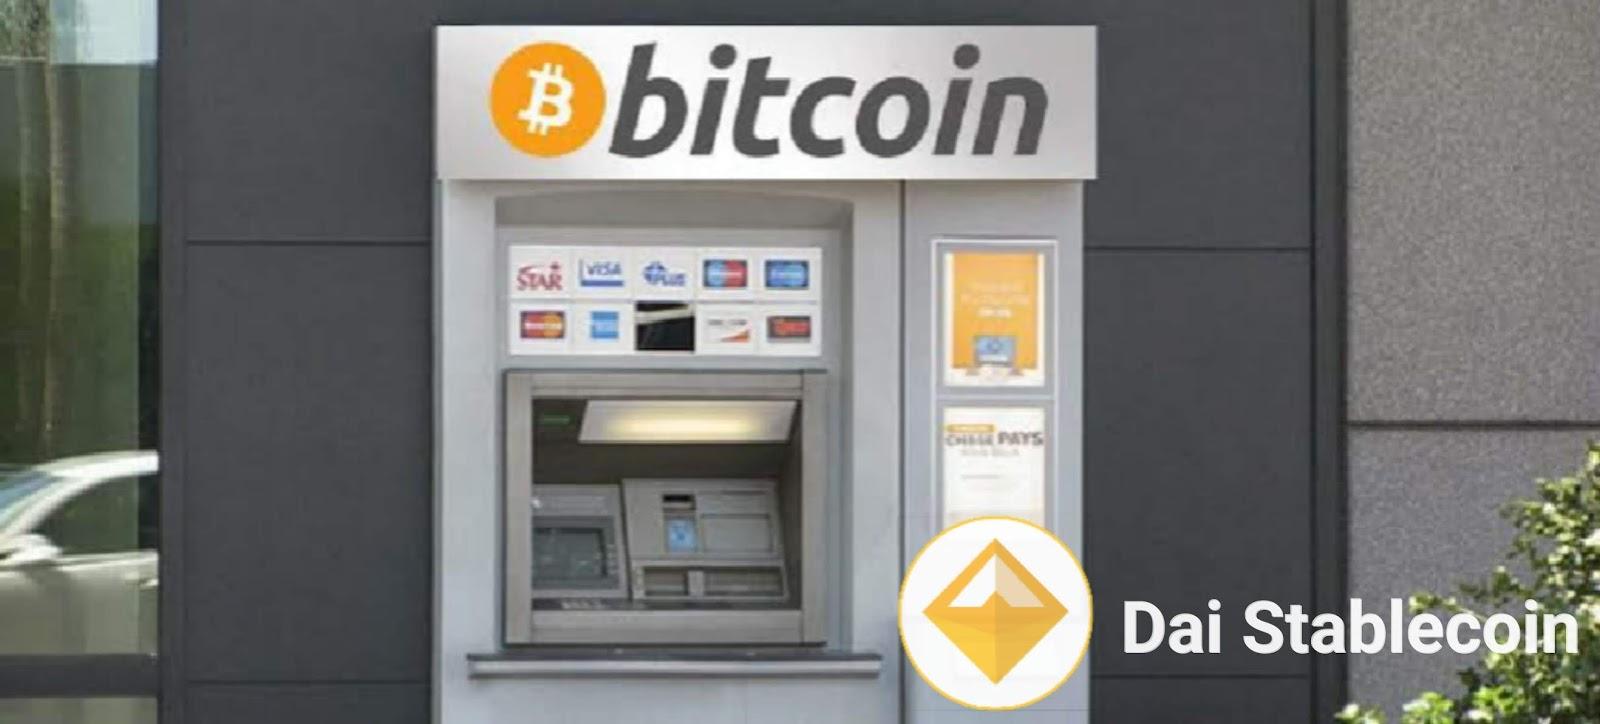 berita cryptocurrency terbaru, berita altcoin terbaru, berita blockchain terbaru, berita cryptocurrency saat ini, berita altcoin saat ini, perkembangan bitcoin atm,